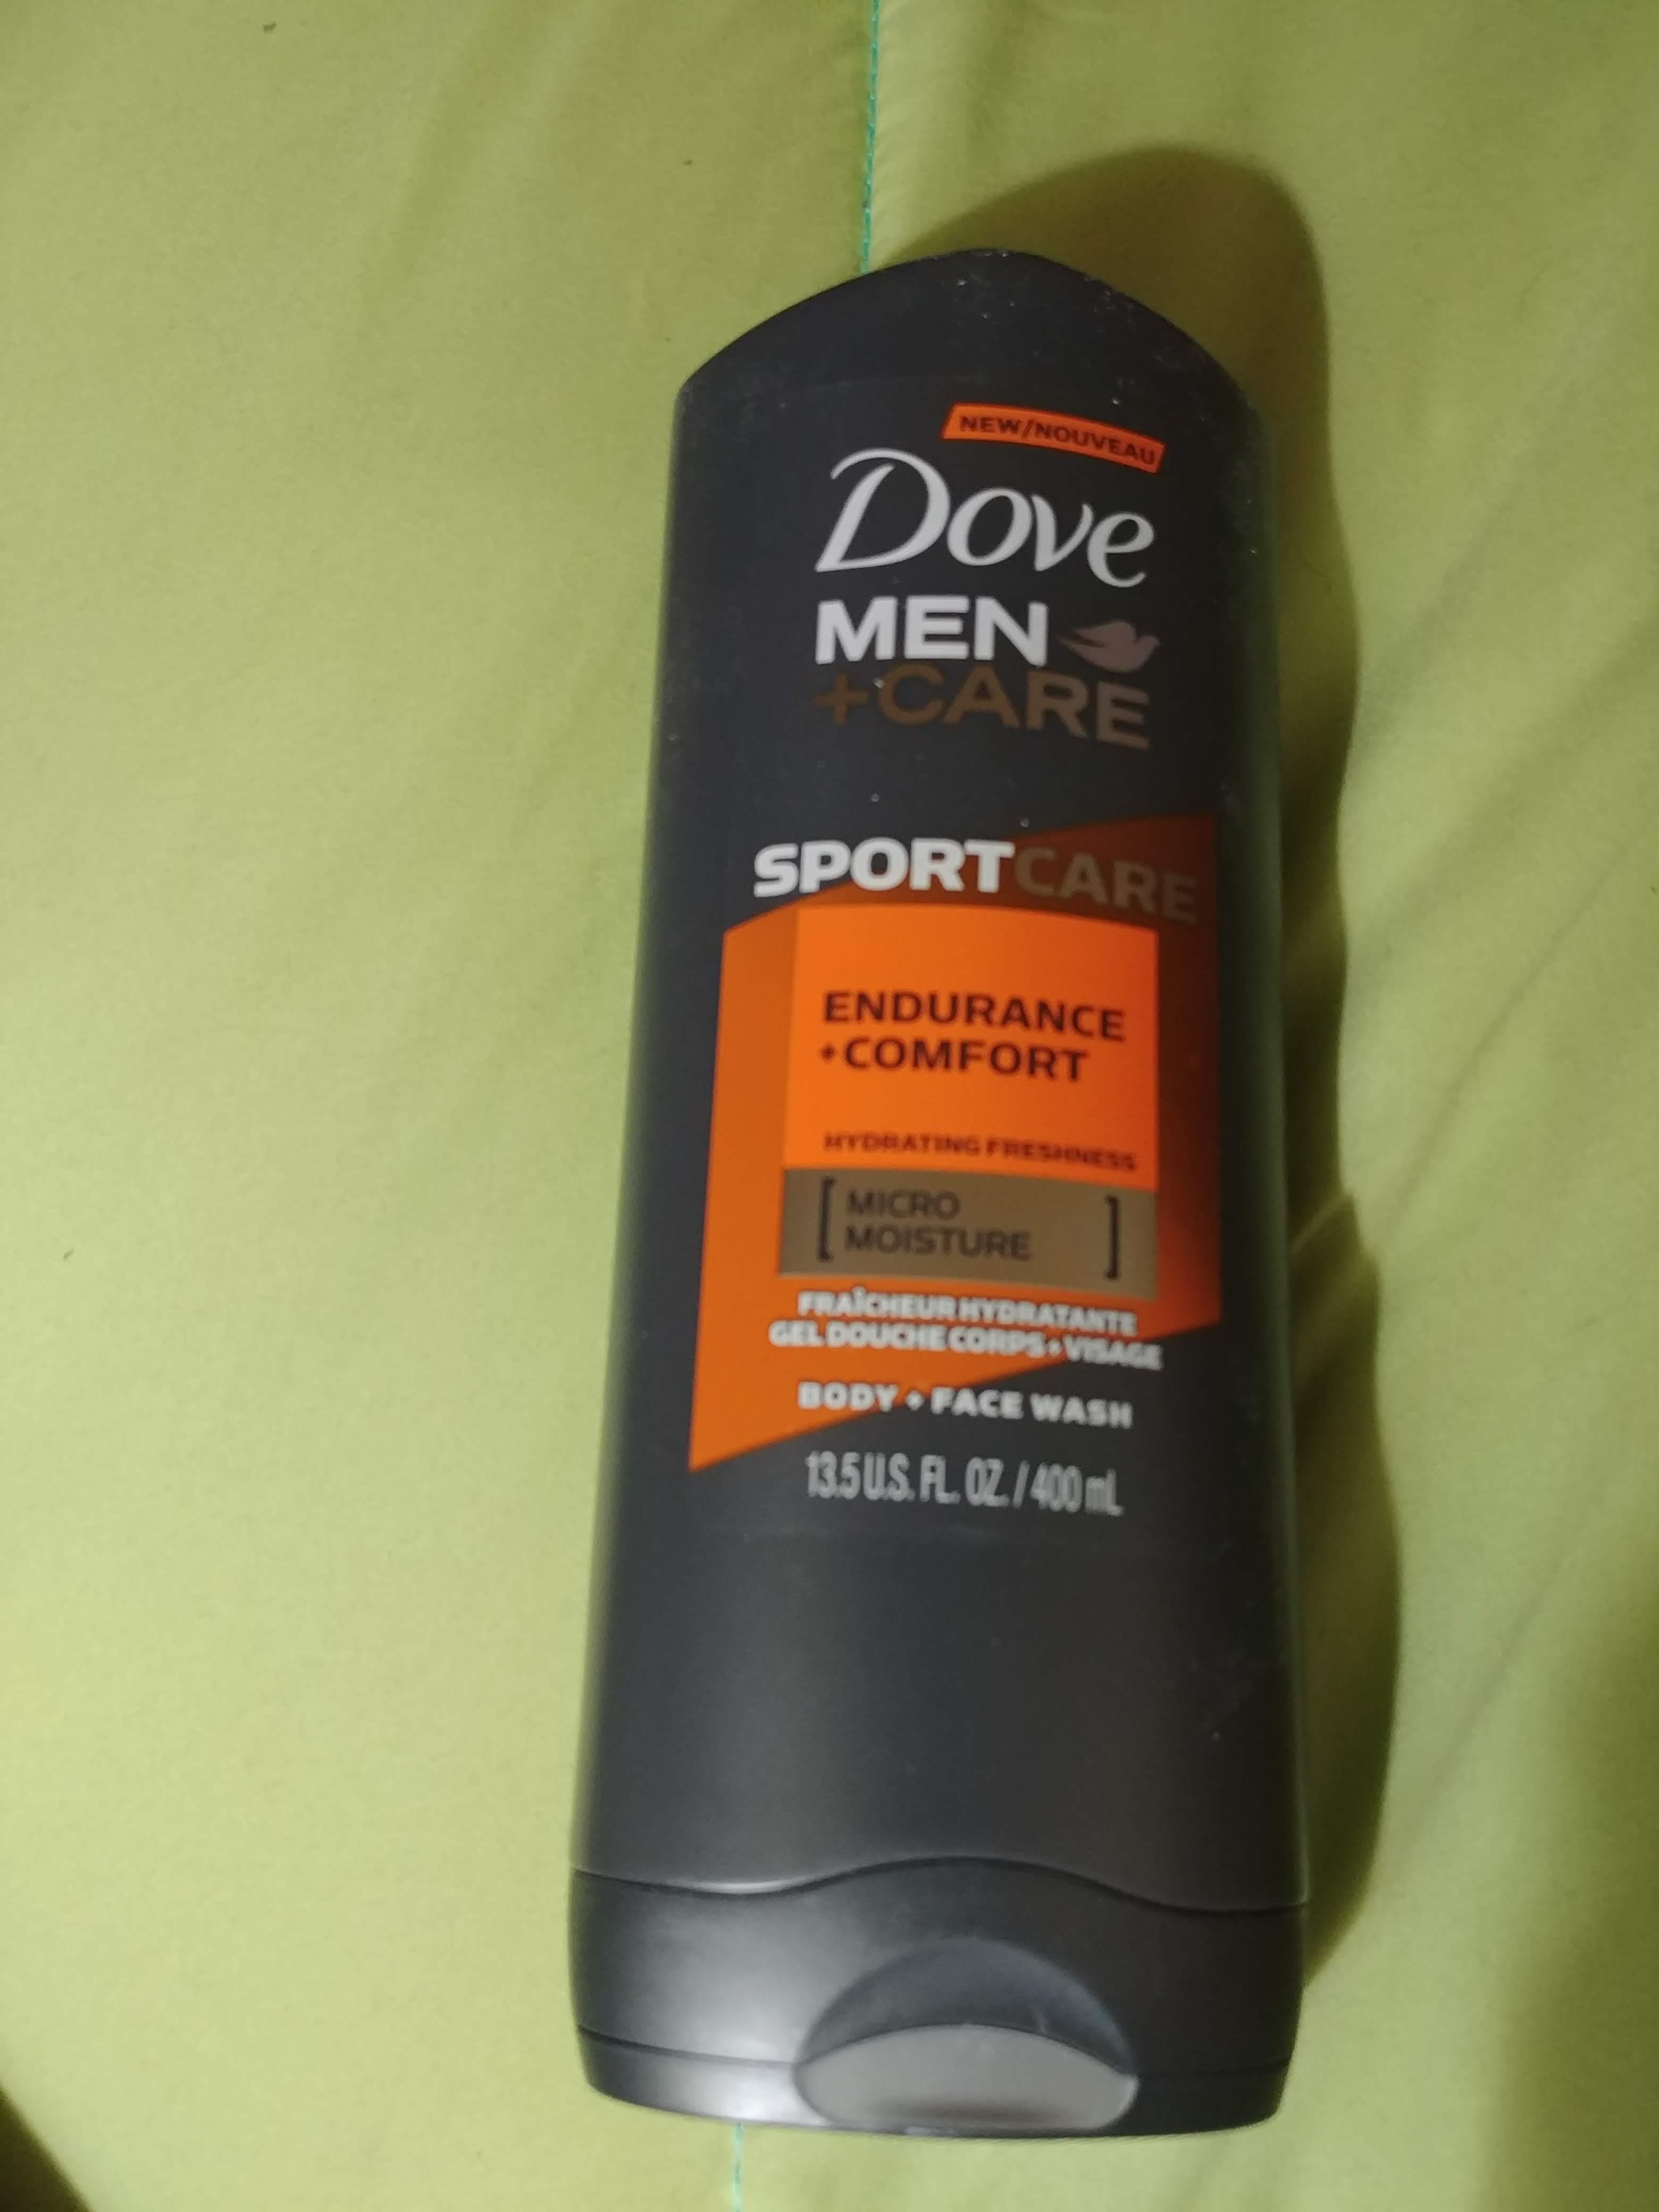 Dove Men Care Sportcare Endurance Comfort Body Face Wash Reviews In Men S Body Wash Chickadvisor